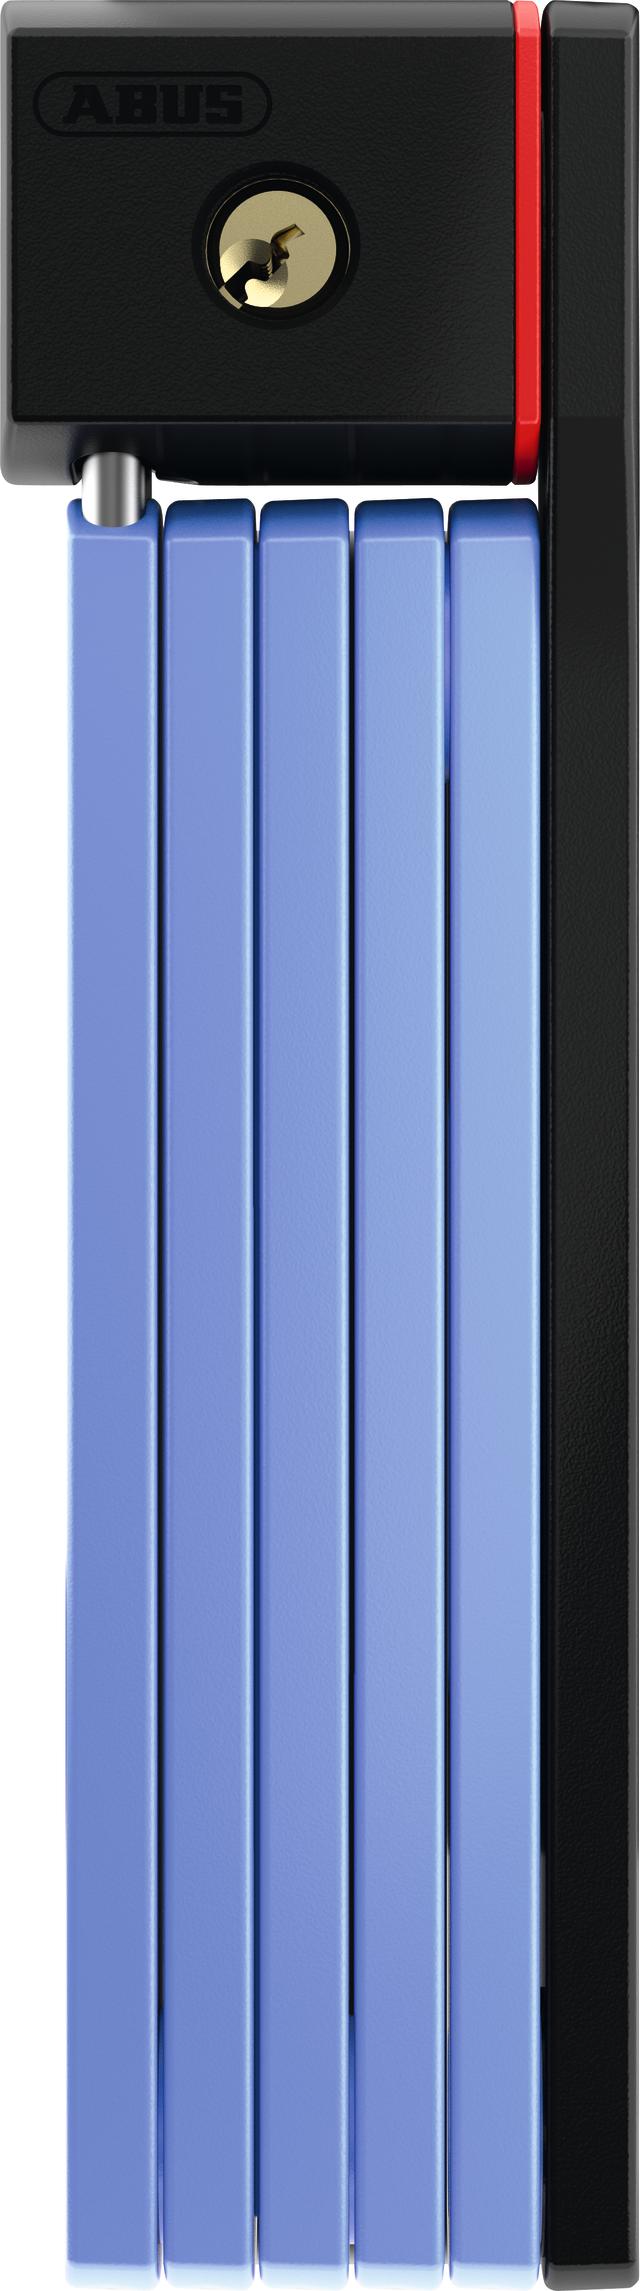 Faltschloss 5700/80 blau SH